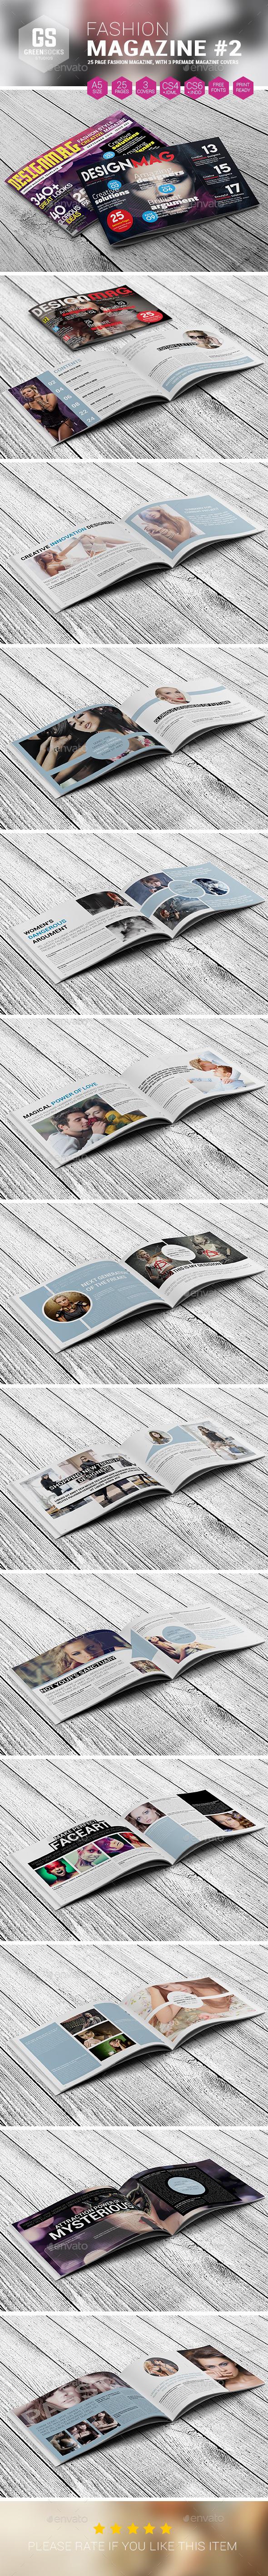 Landscape Fashion Magazine #2 - Magazines Print Templates